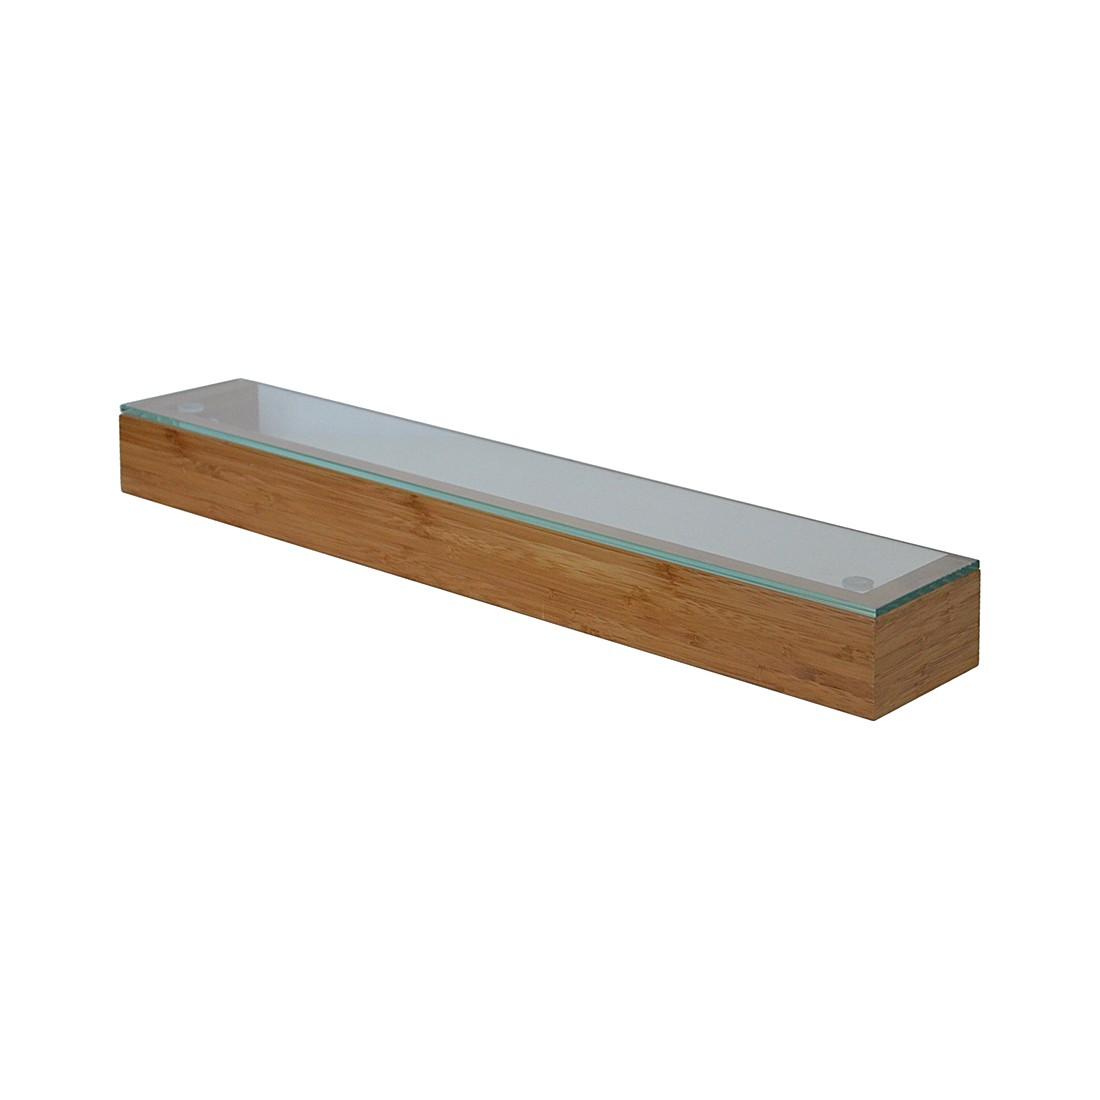 Wandplank met glas 55cm Arena - bamboe, Wireworks